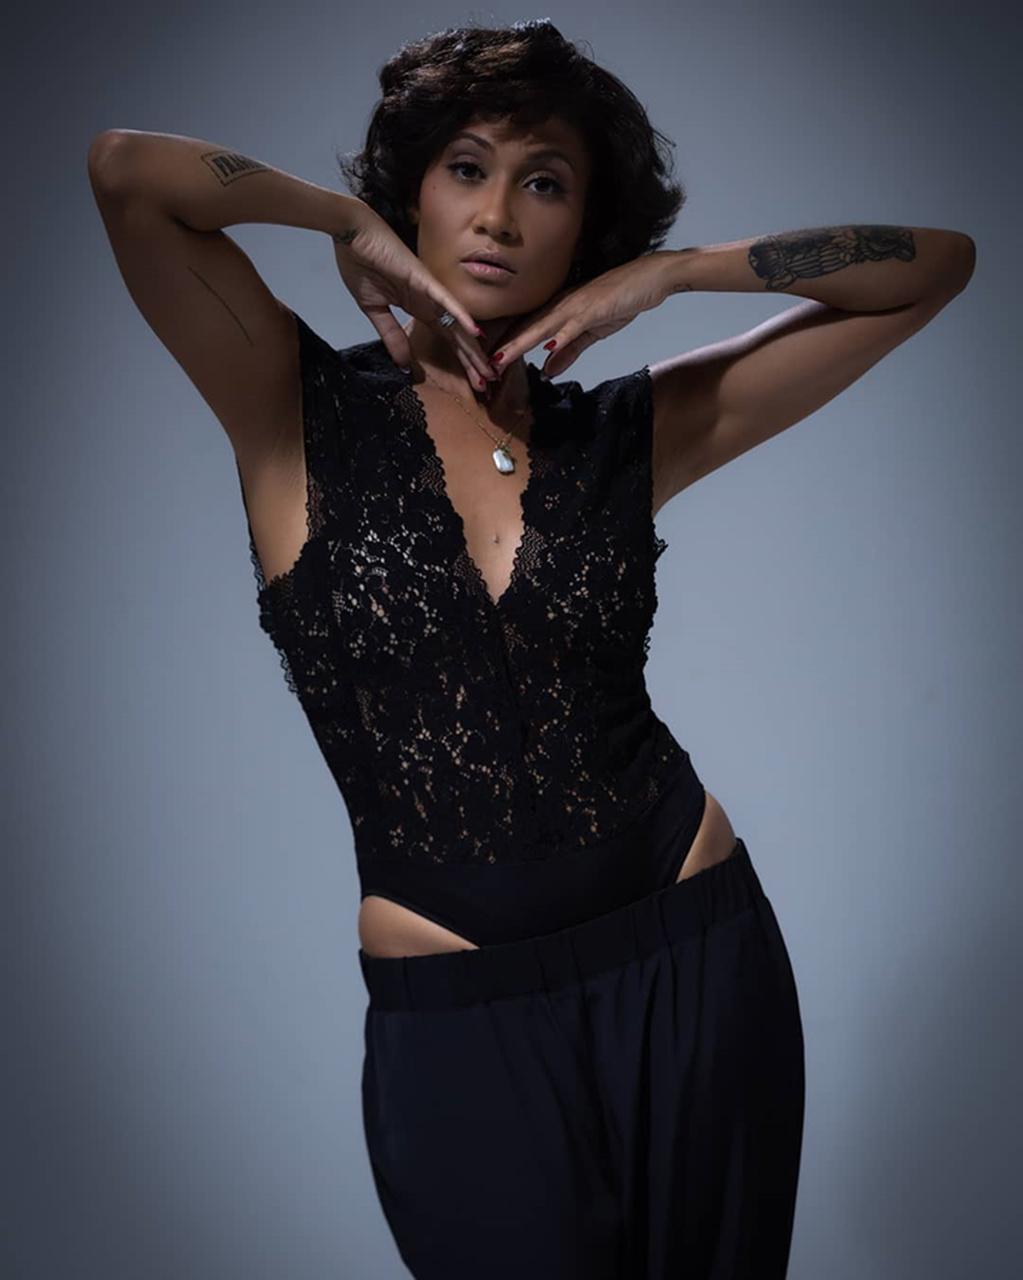 Cor preta: a favorita de Bruna Sousa?